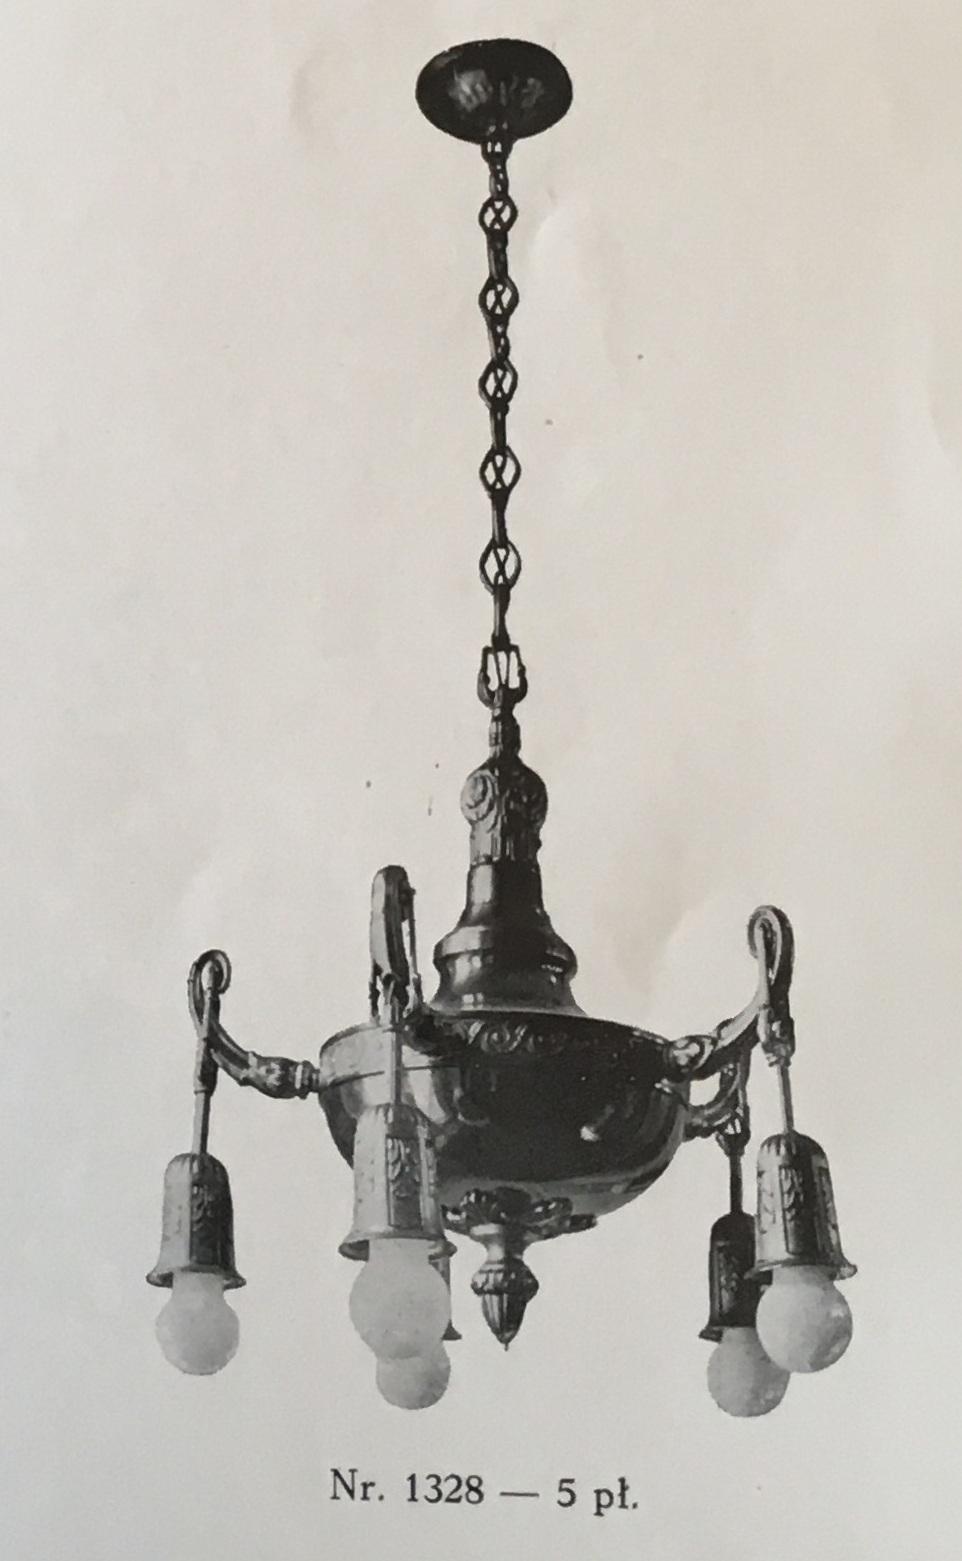 A chandelier from the catalogue of 1928 of the Nowik & Serejski factory. Reproduced from: Katalog fabryka żyrandoli Nowik i Serejski, Warszawa, 1928, p. 23.